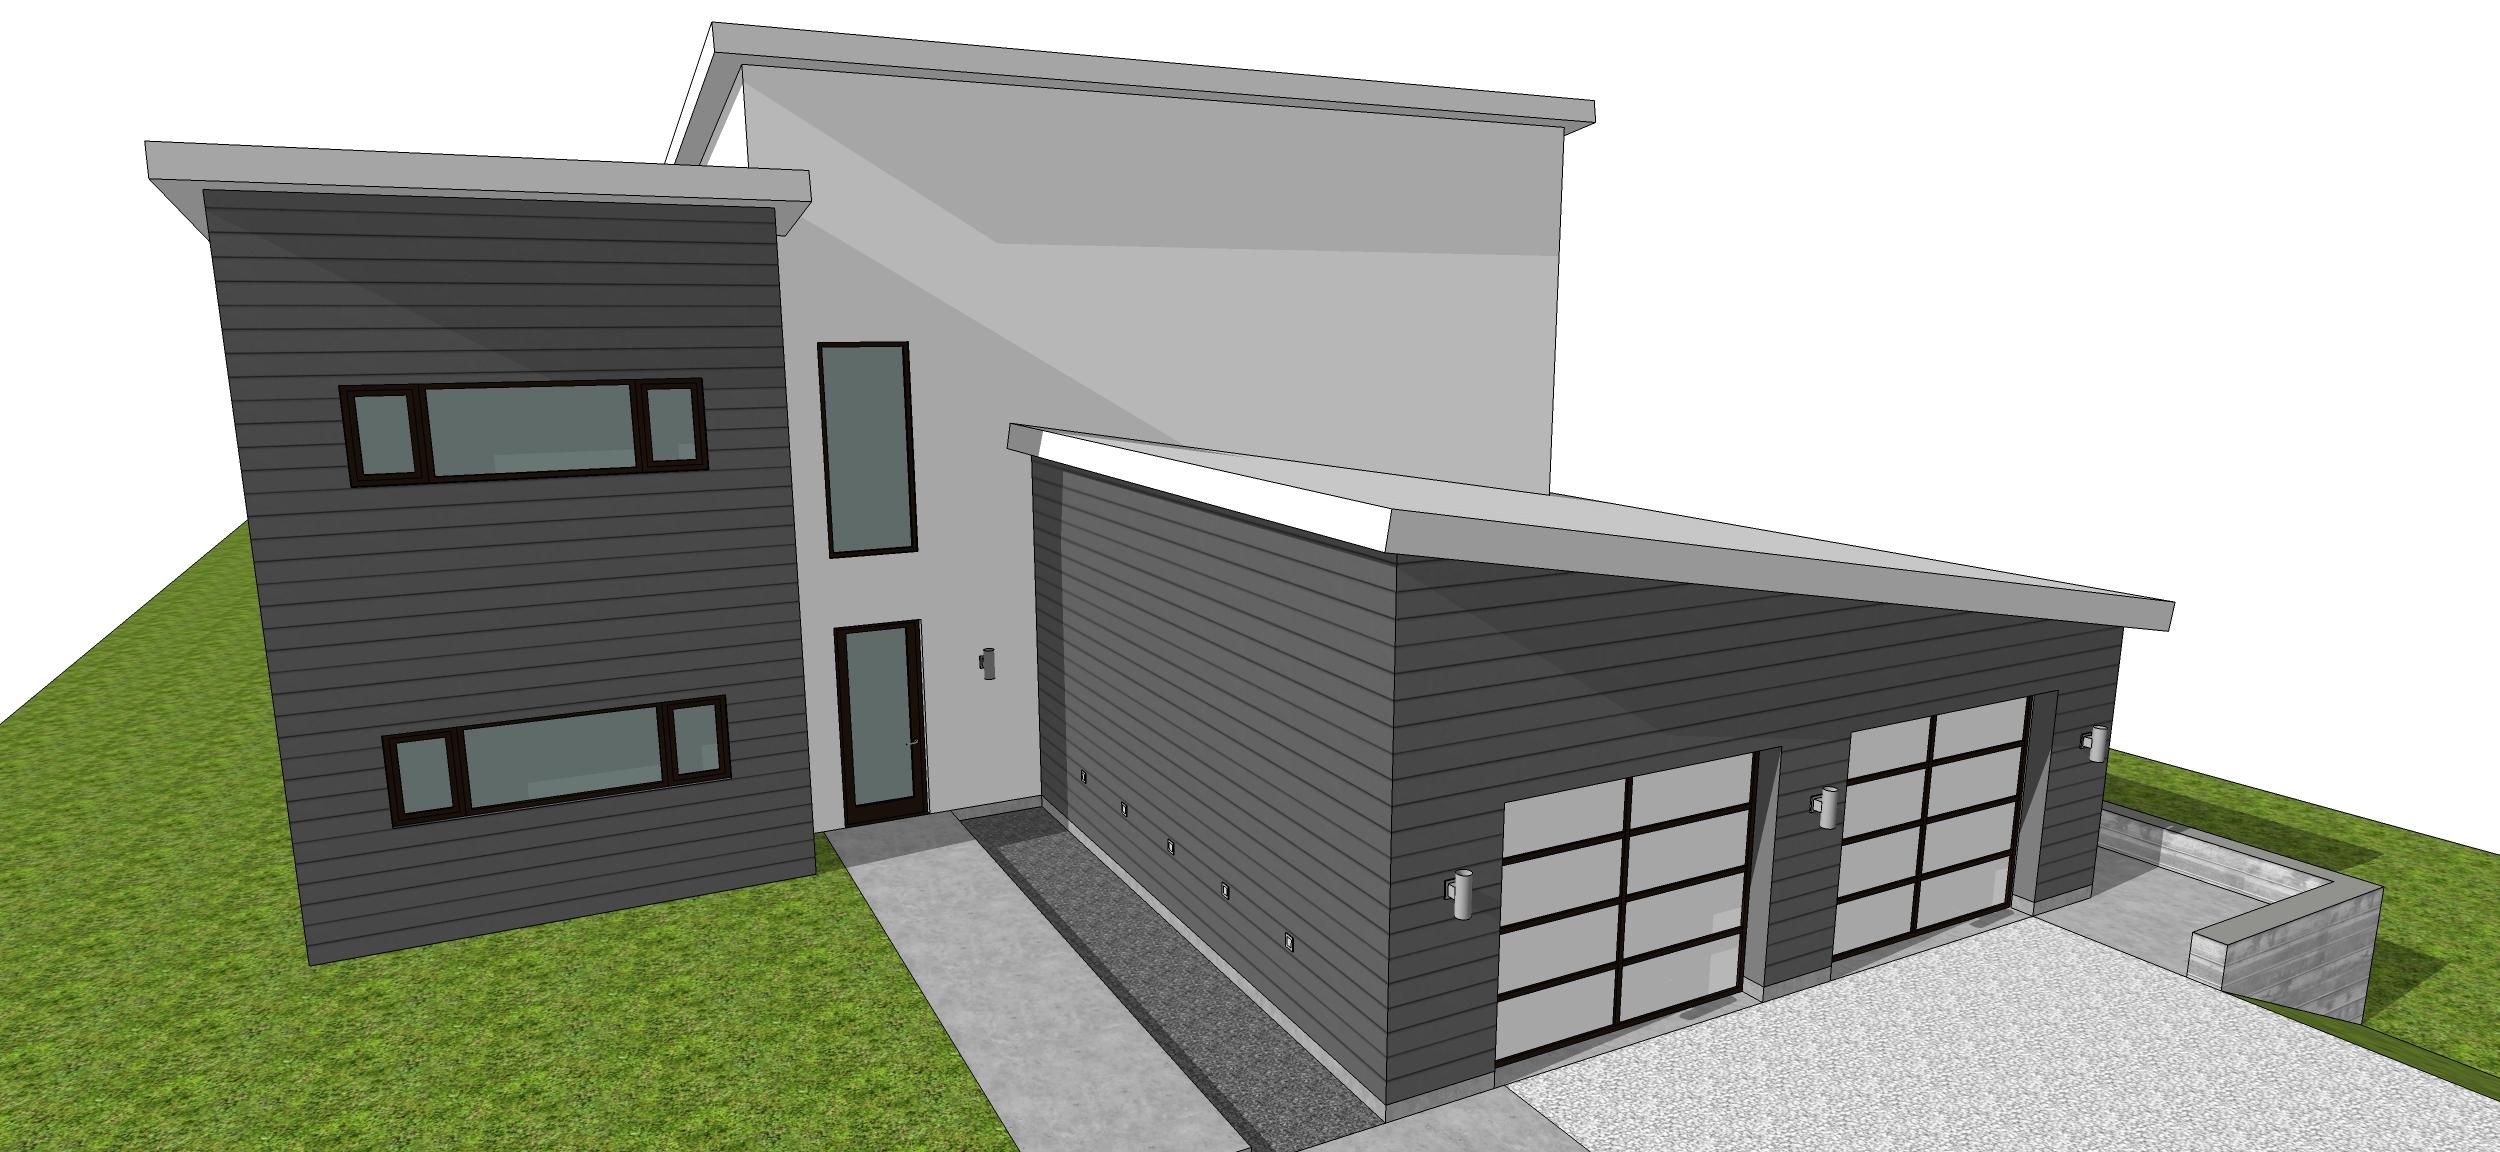 House 2 - Northeast View.jpg